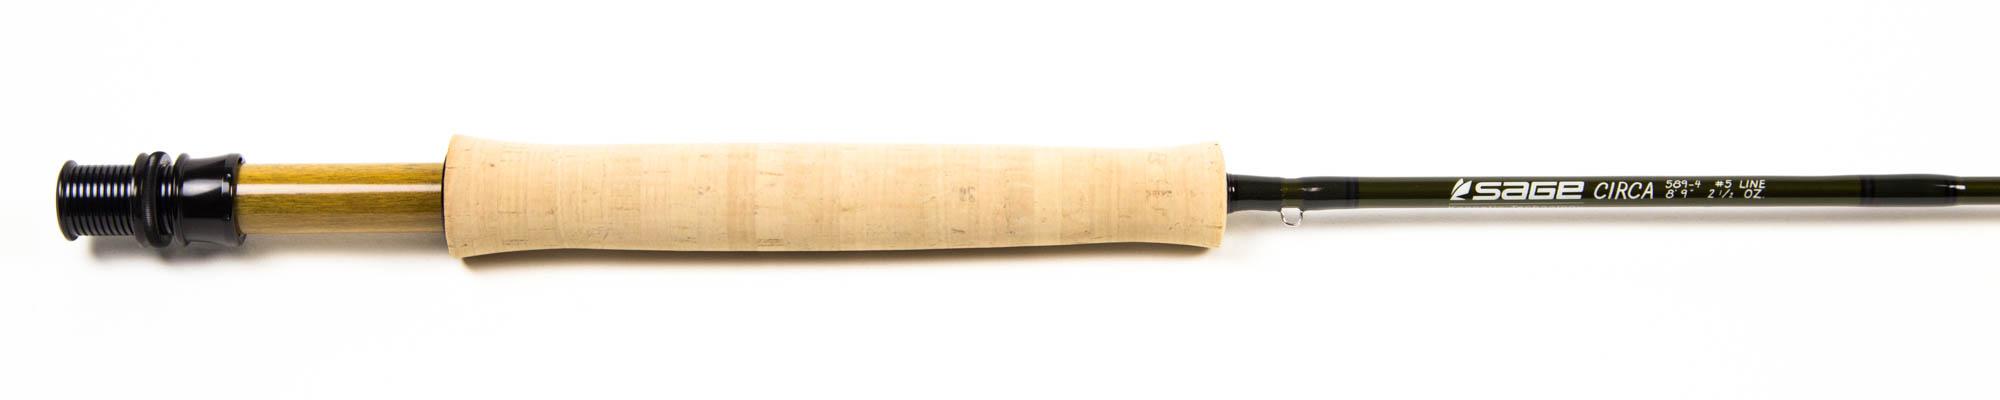 Sage Circa Fly Rod 140